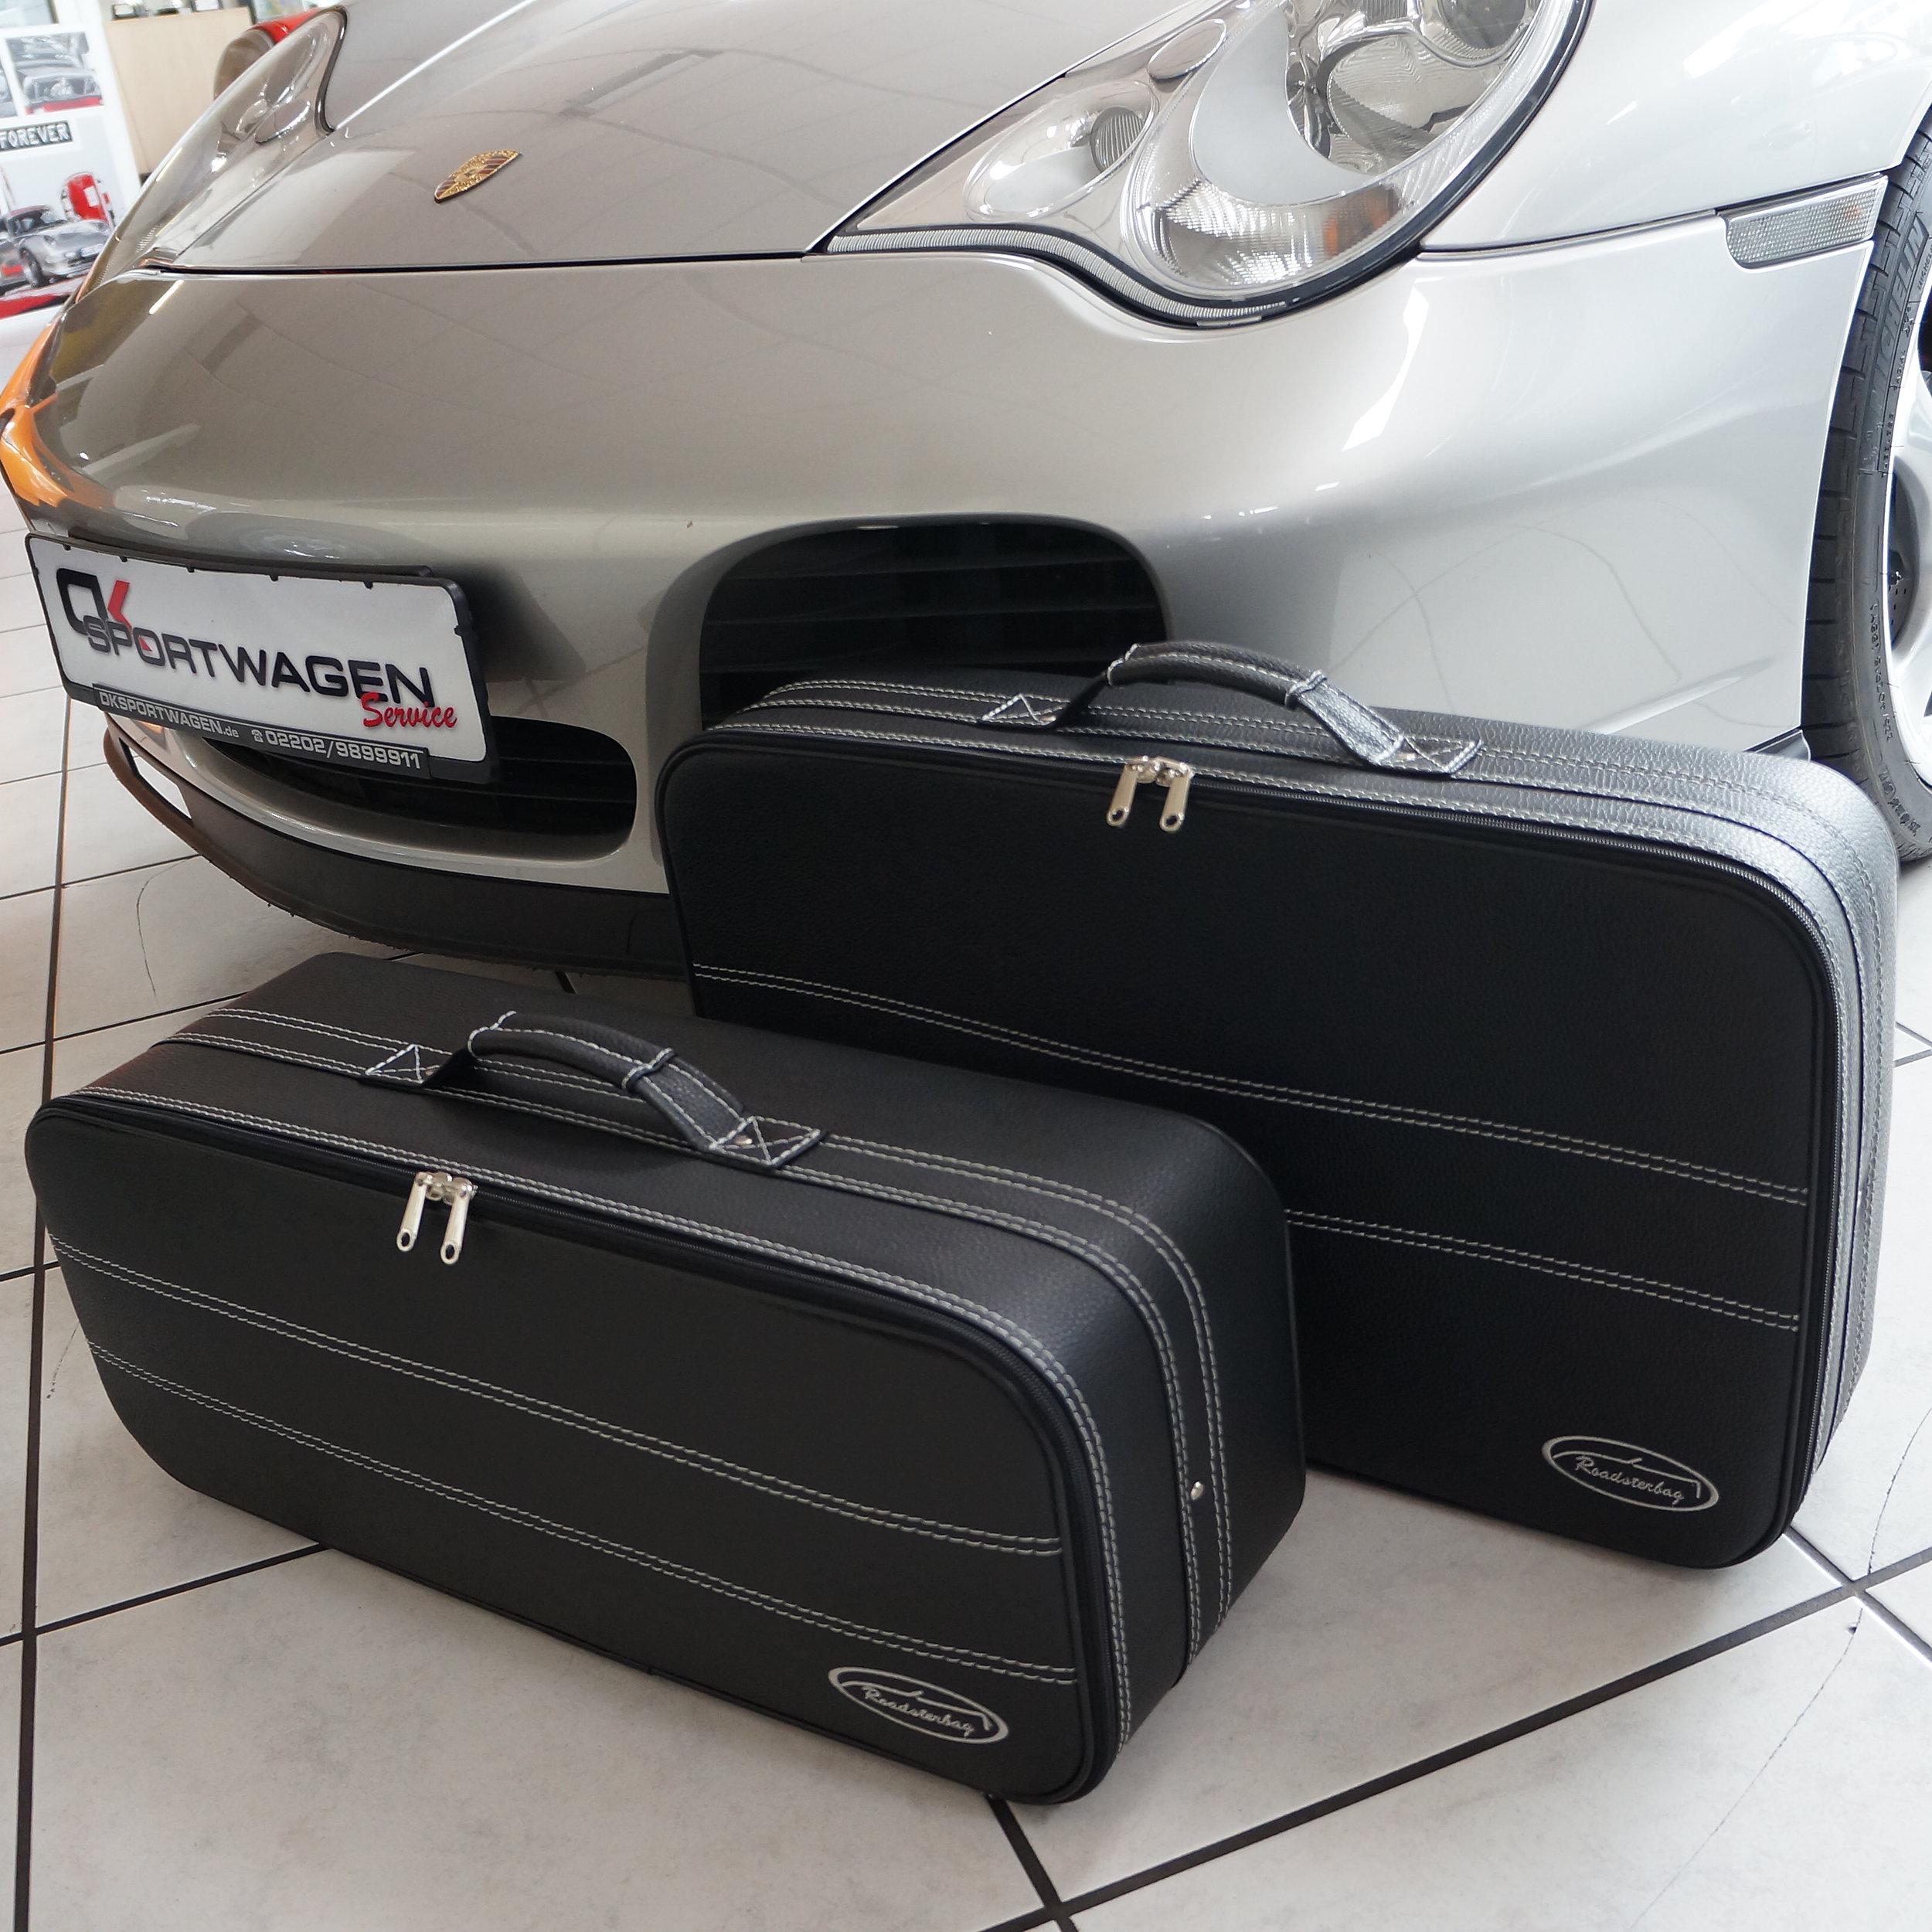 2-tlg. Kofferset Porsche 911 (996 Turbo/Allrad) XXL